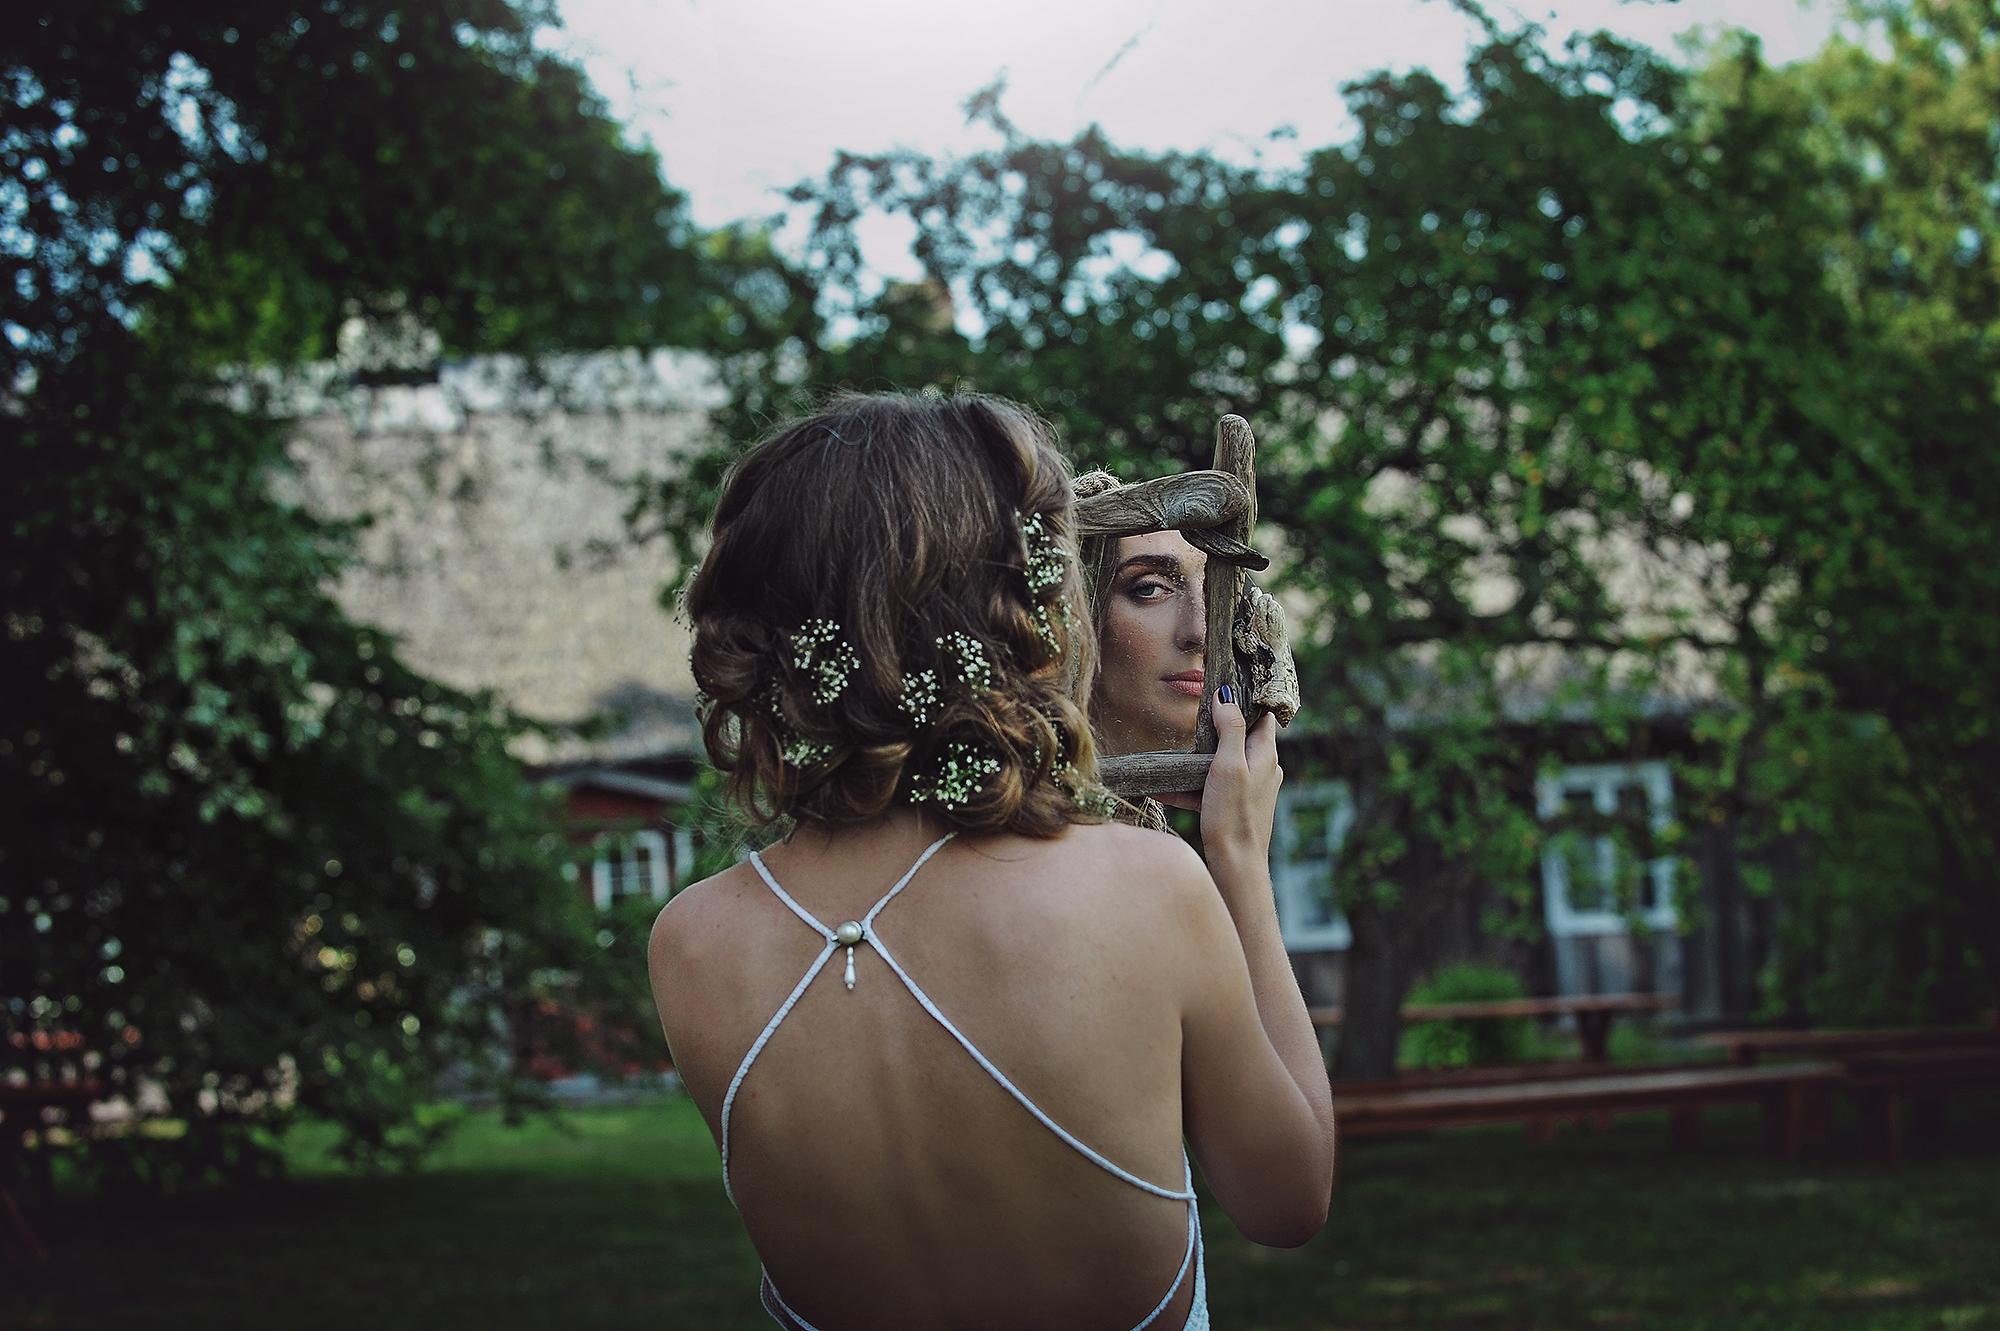 Lina_Ruskyte-Lukoseviciene_portrait avant garde_July_LT_16